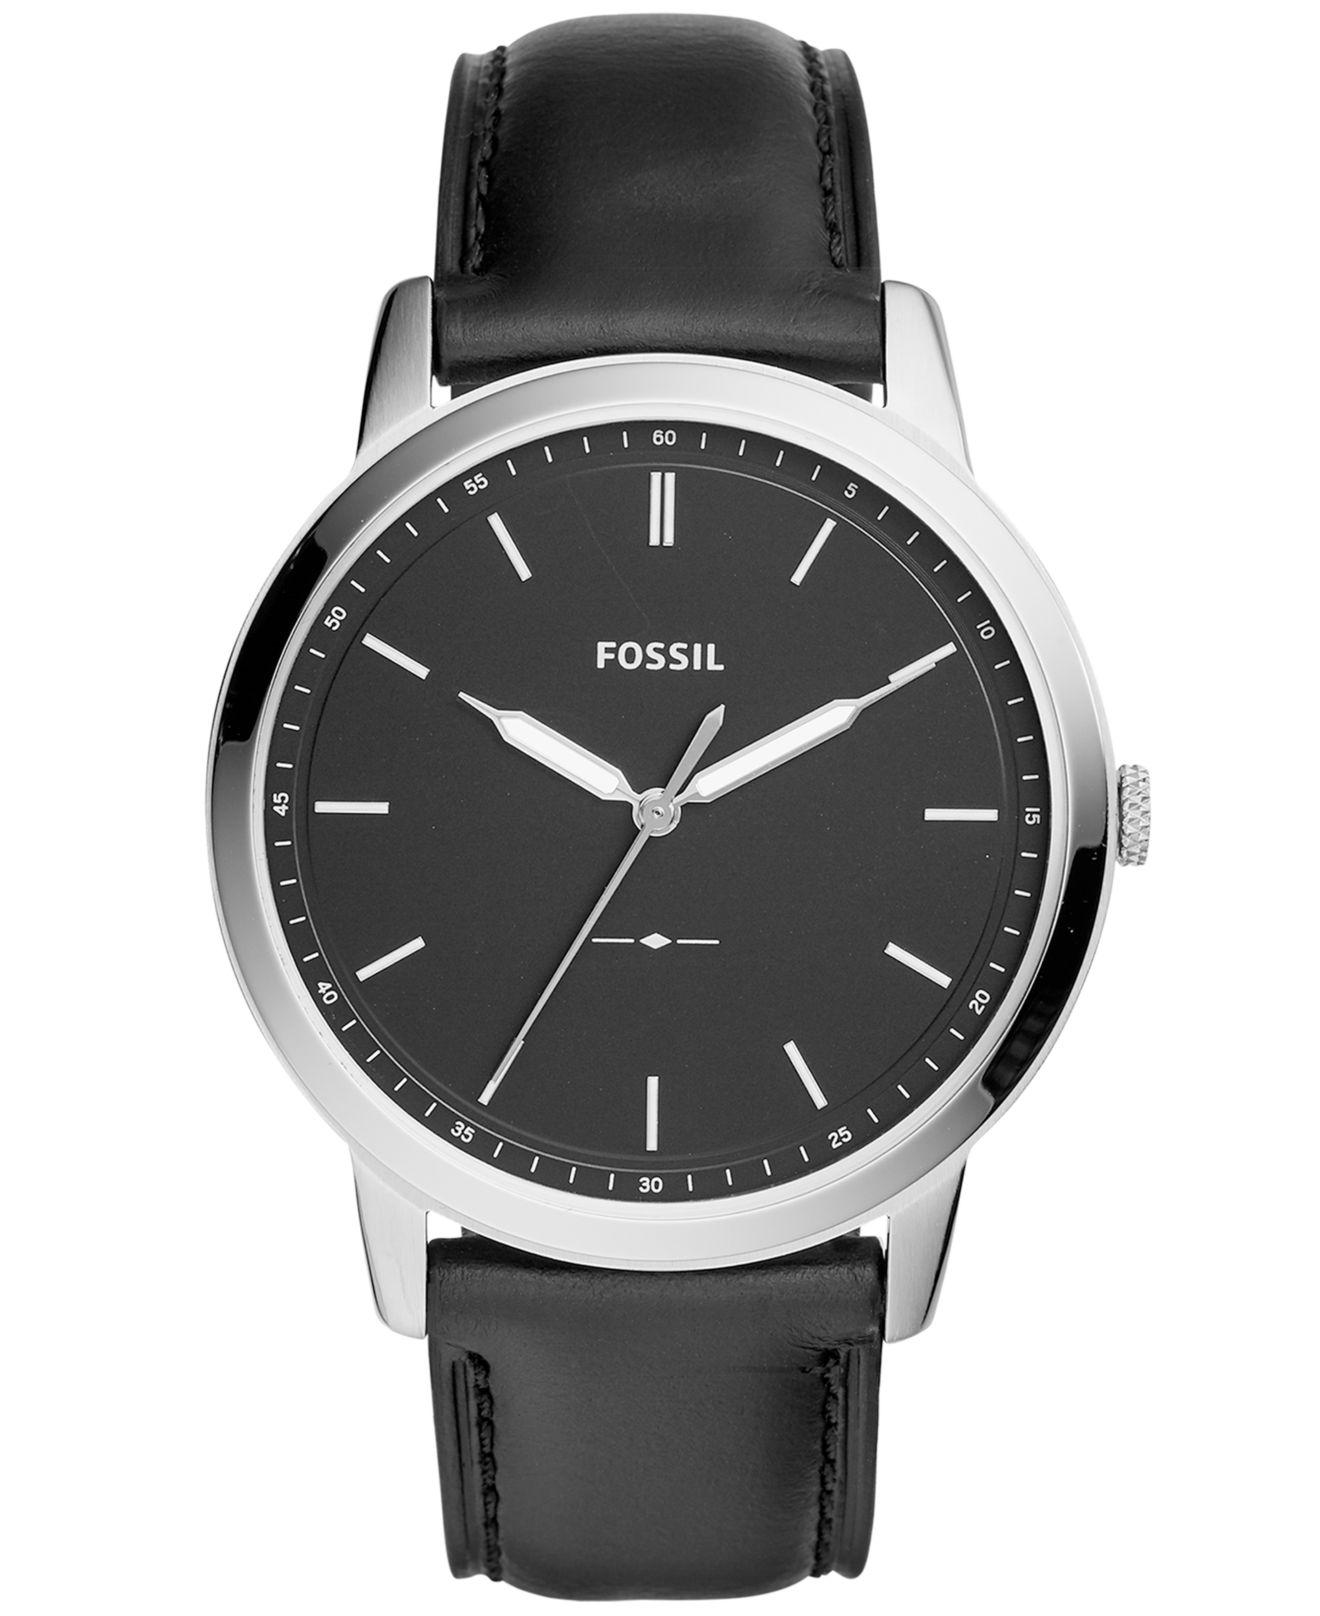 eb2165627e73 Fossil - Men s Minimalist Black Leather Strap Watch 44mm for Men - Lyst.  View fullscreen